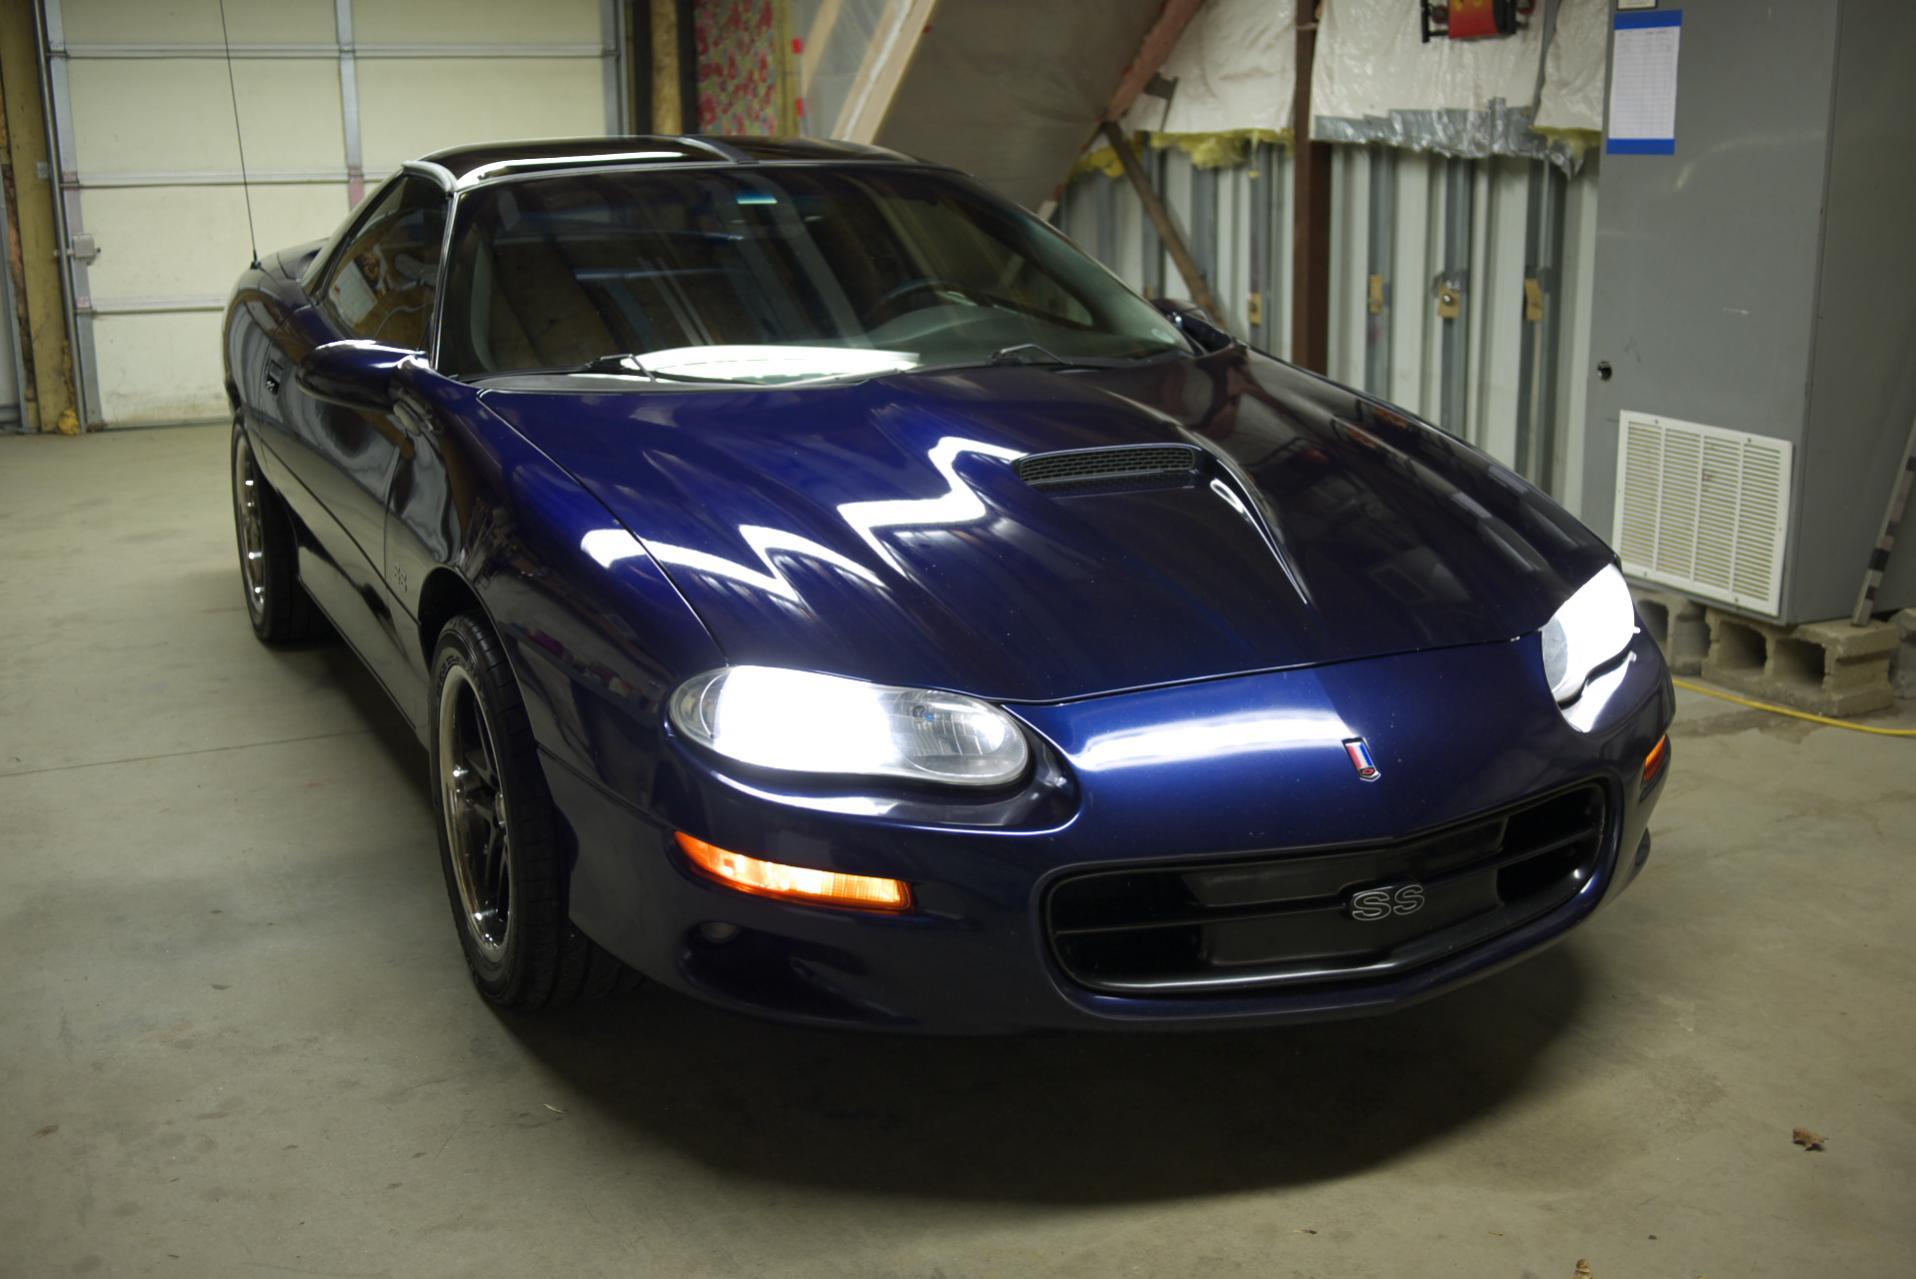 2002 Camaro SS SLP california car  LS1TECH  Camaro and